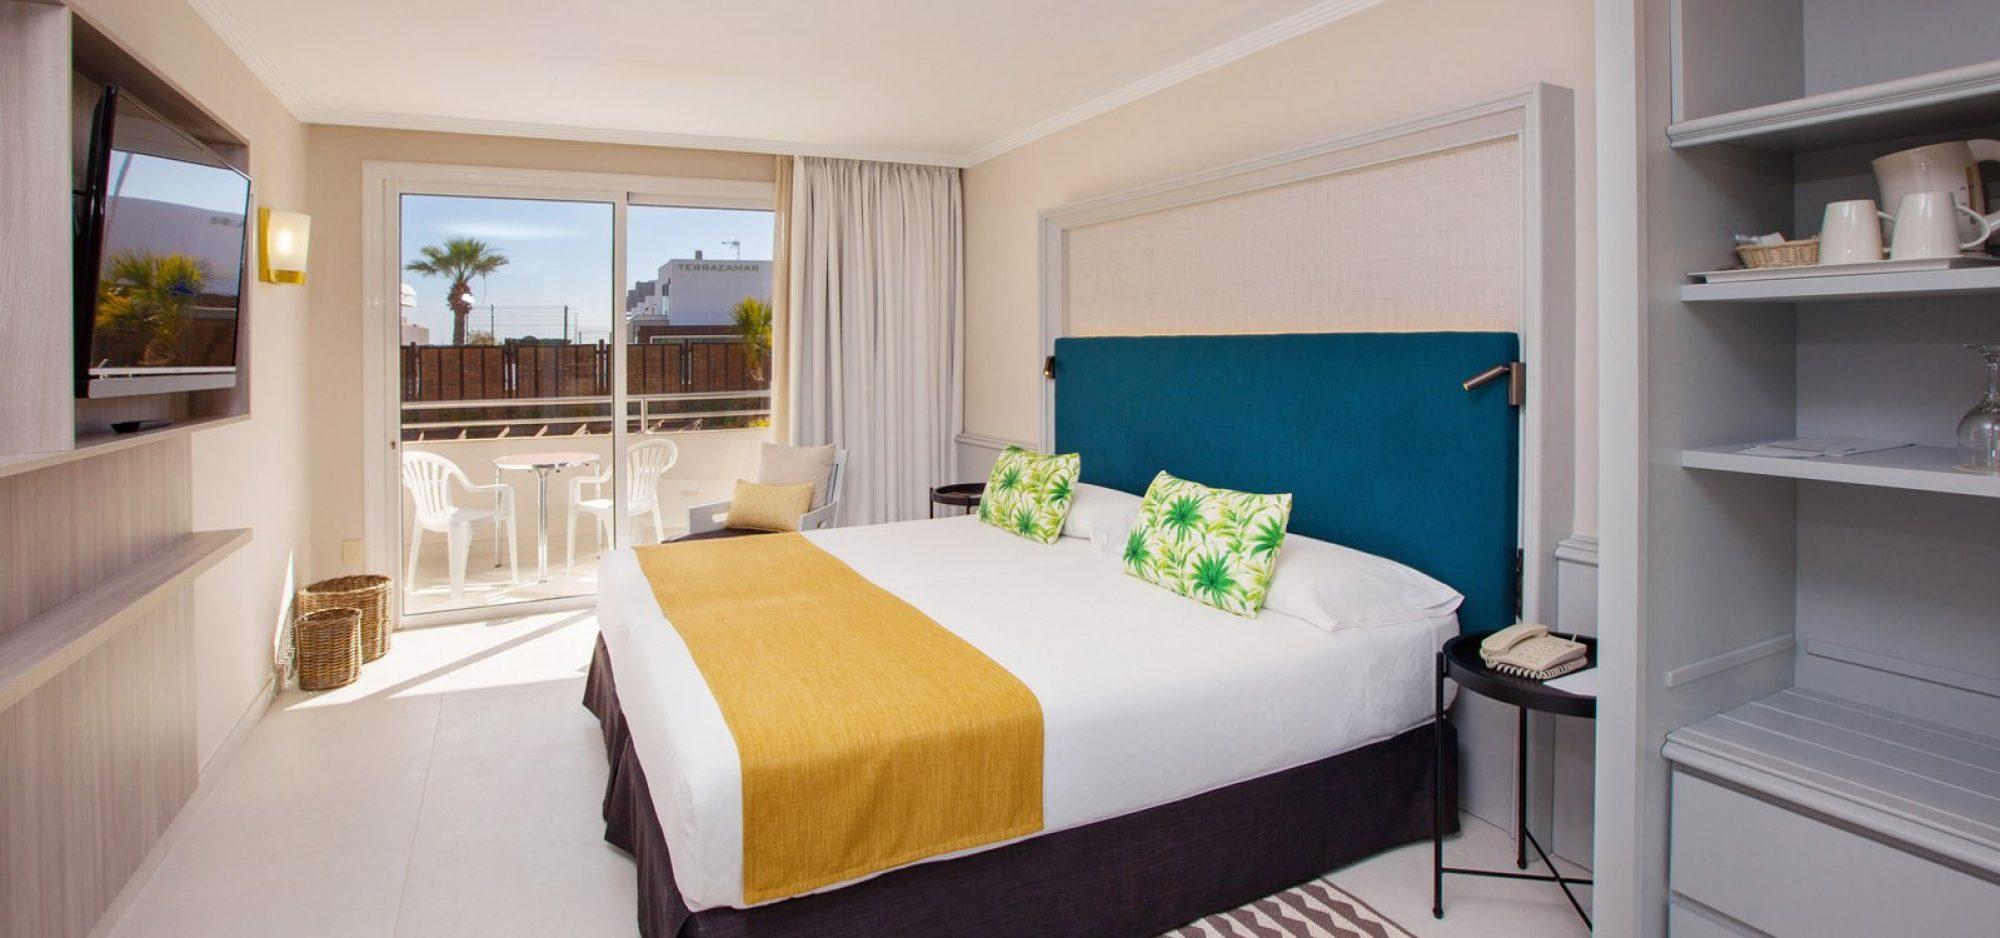 Habitación Doble Estándar - Corallium Dunamar by Lopesan Hotels